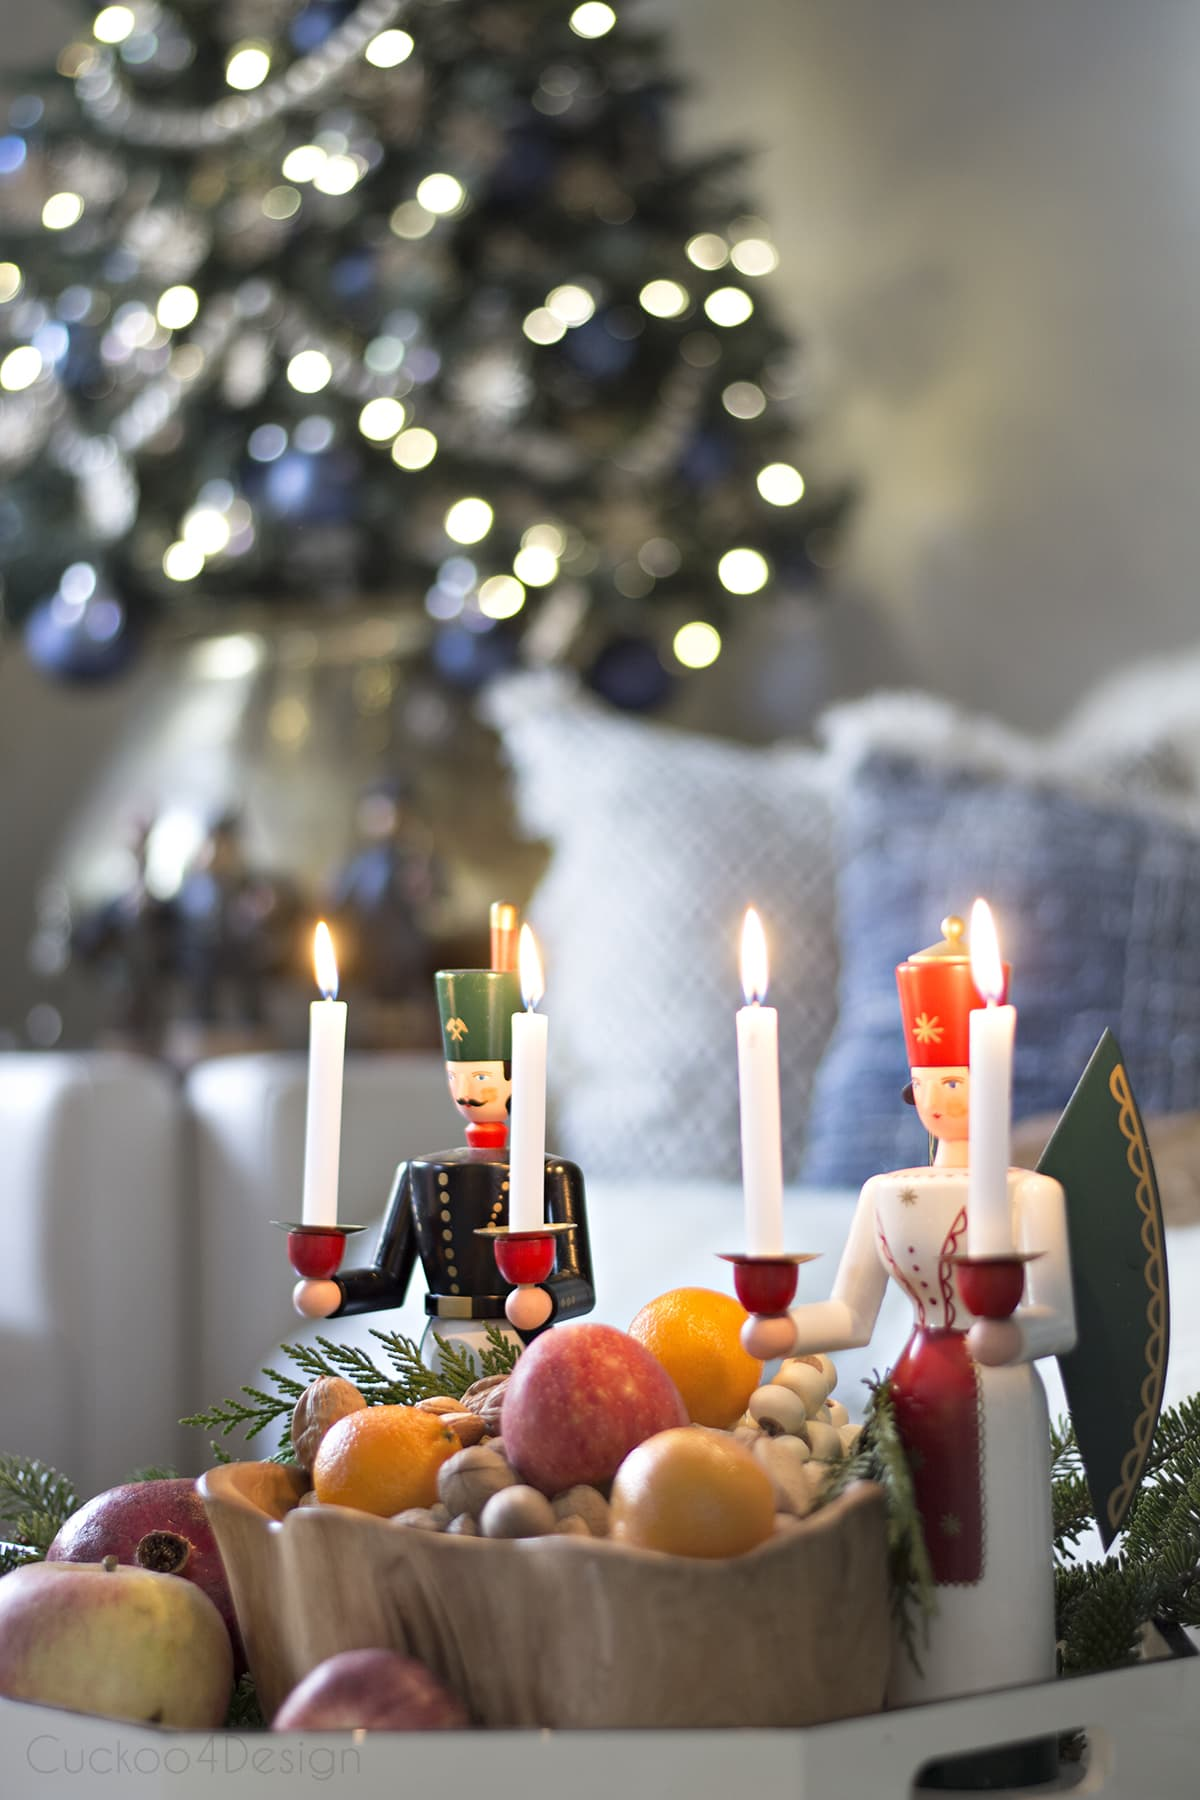 modern take on traditional European/German Christmas decor